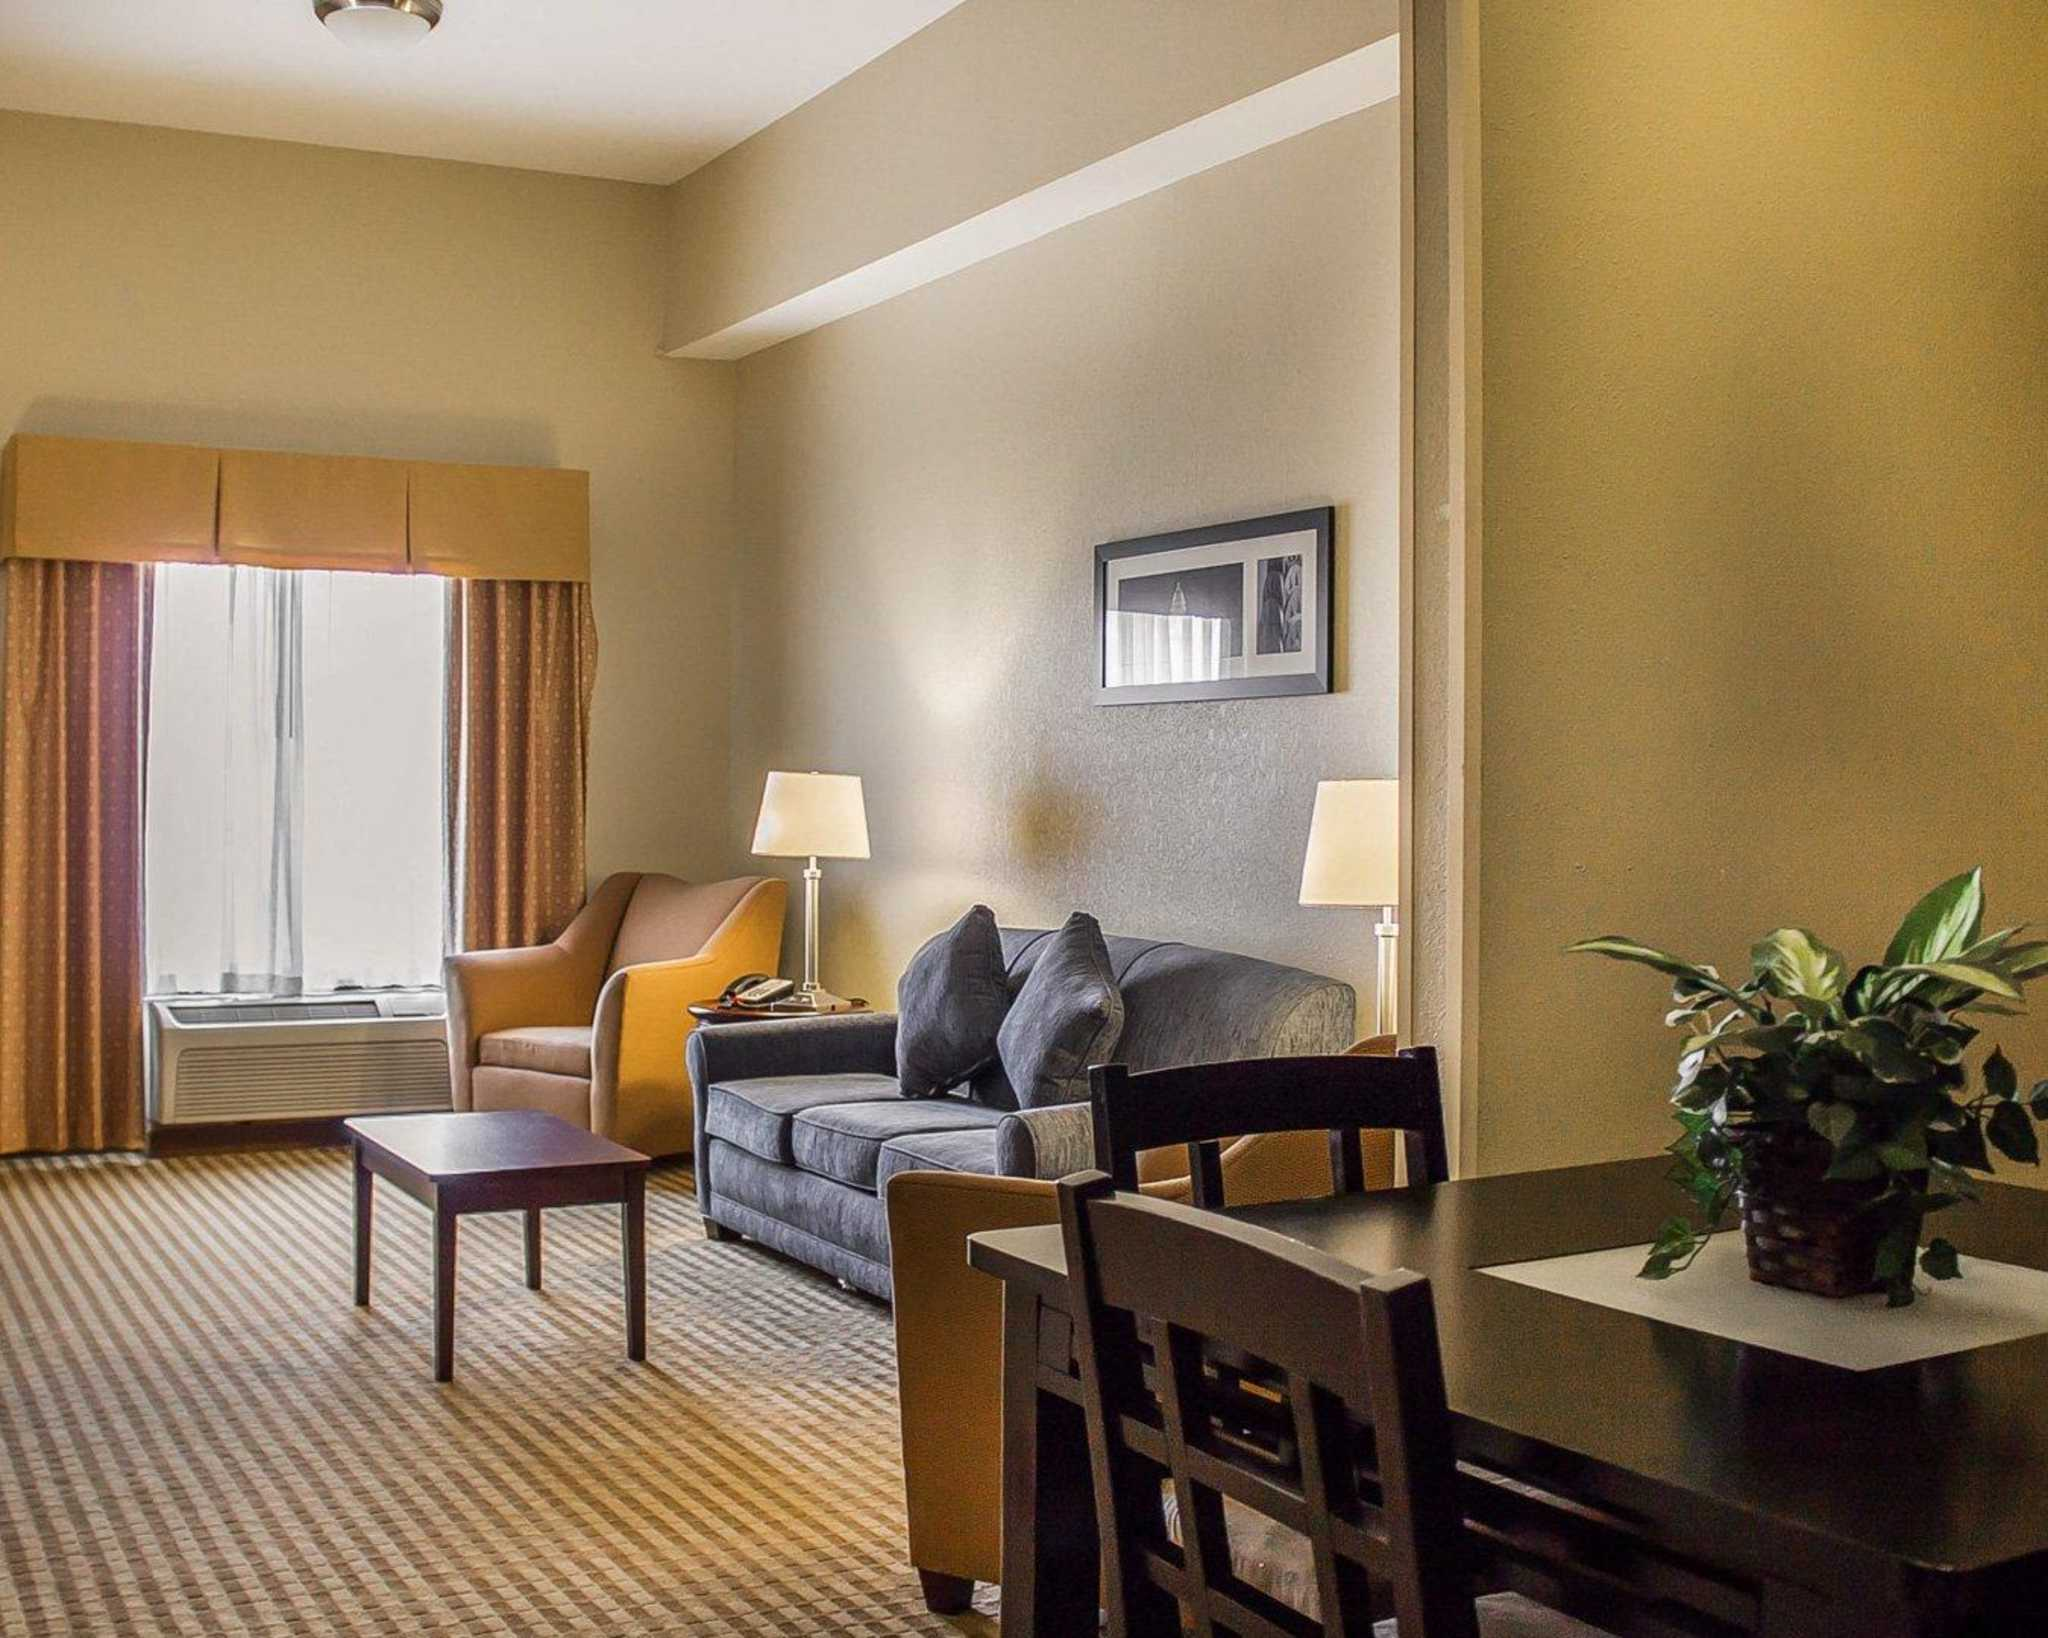 Comfort Suites East Broad at 270 image 19